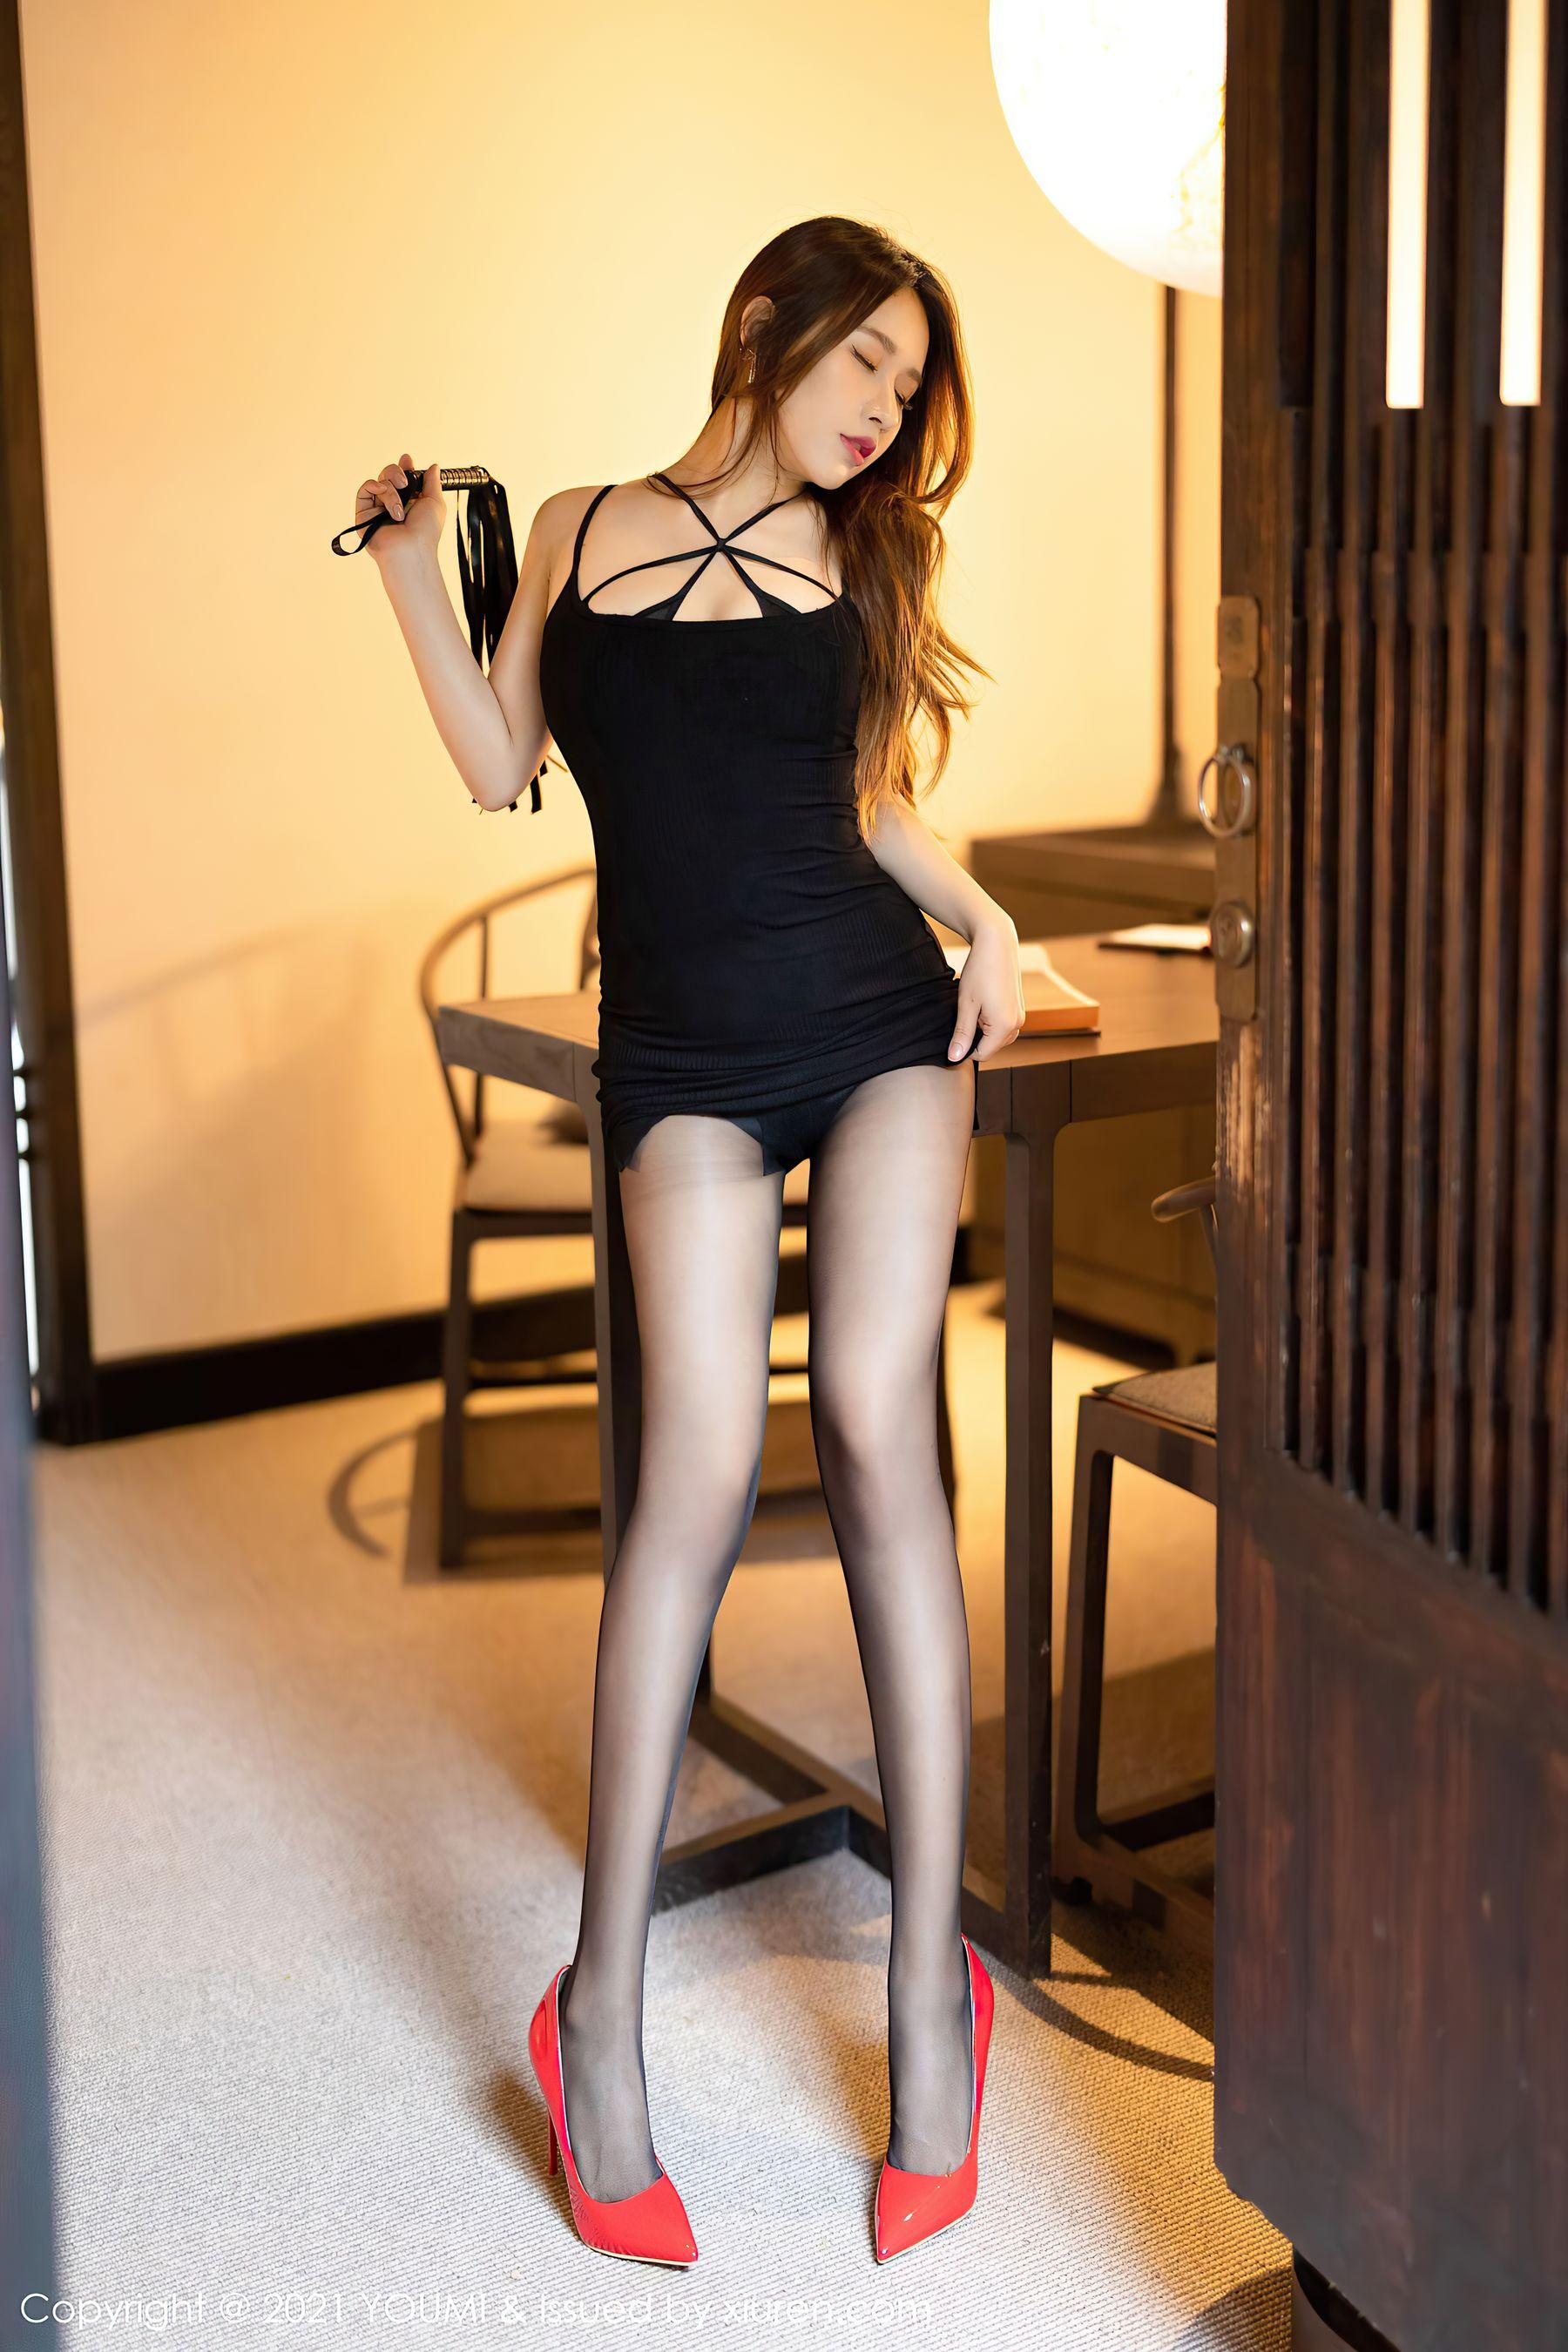 VOL.1643 [尤蜜荟]丝袜女郎黑丝诱惑:徐安安超高清写真套图(42P)